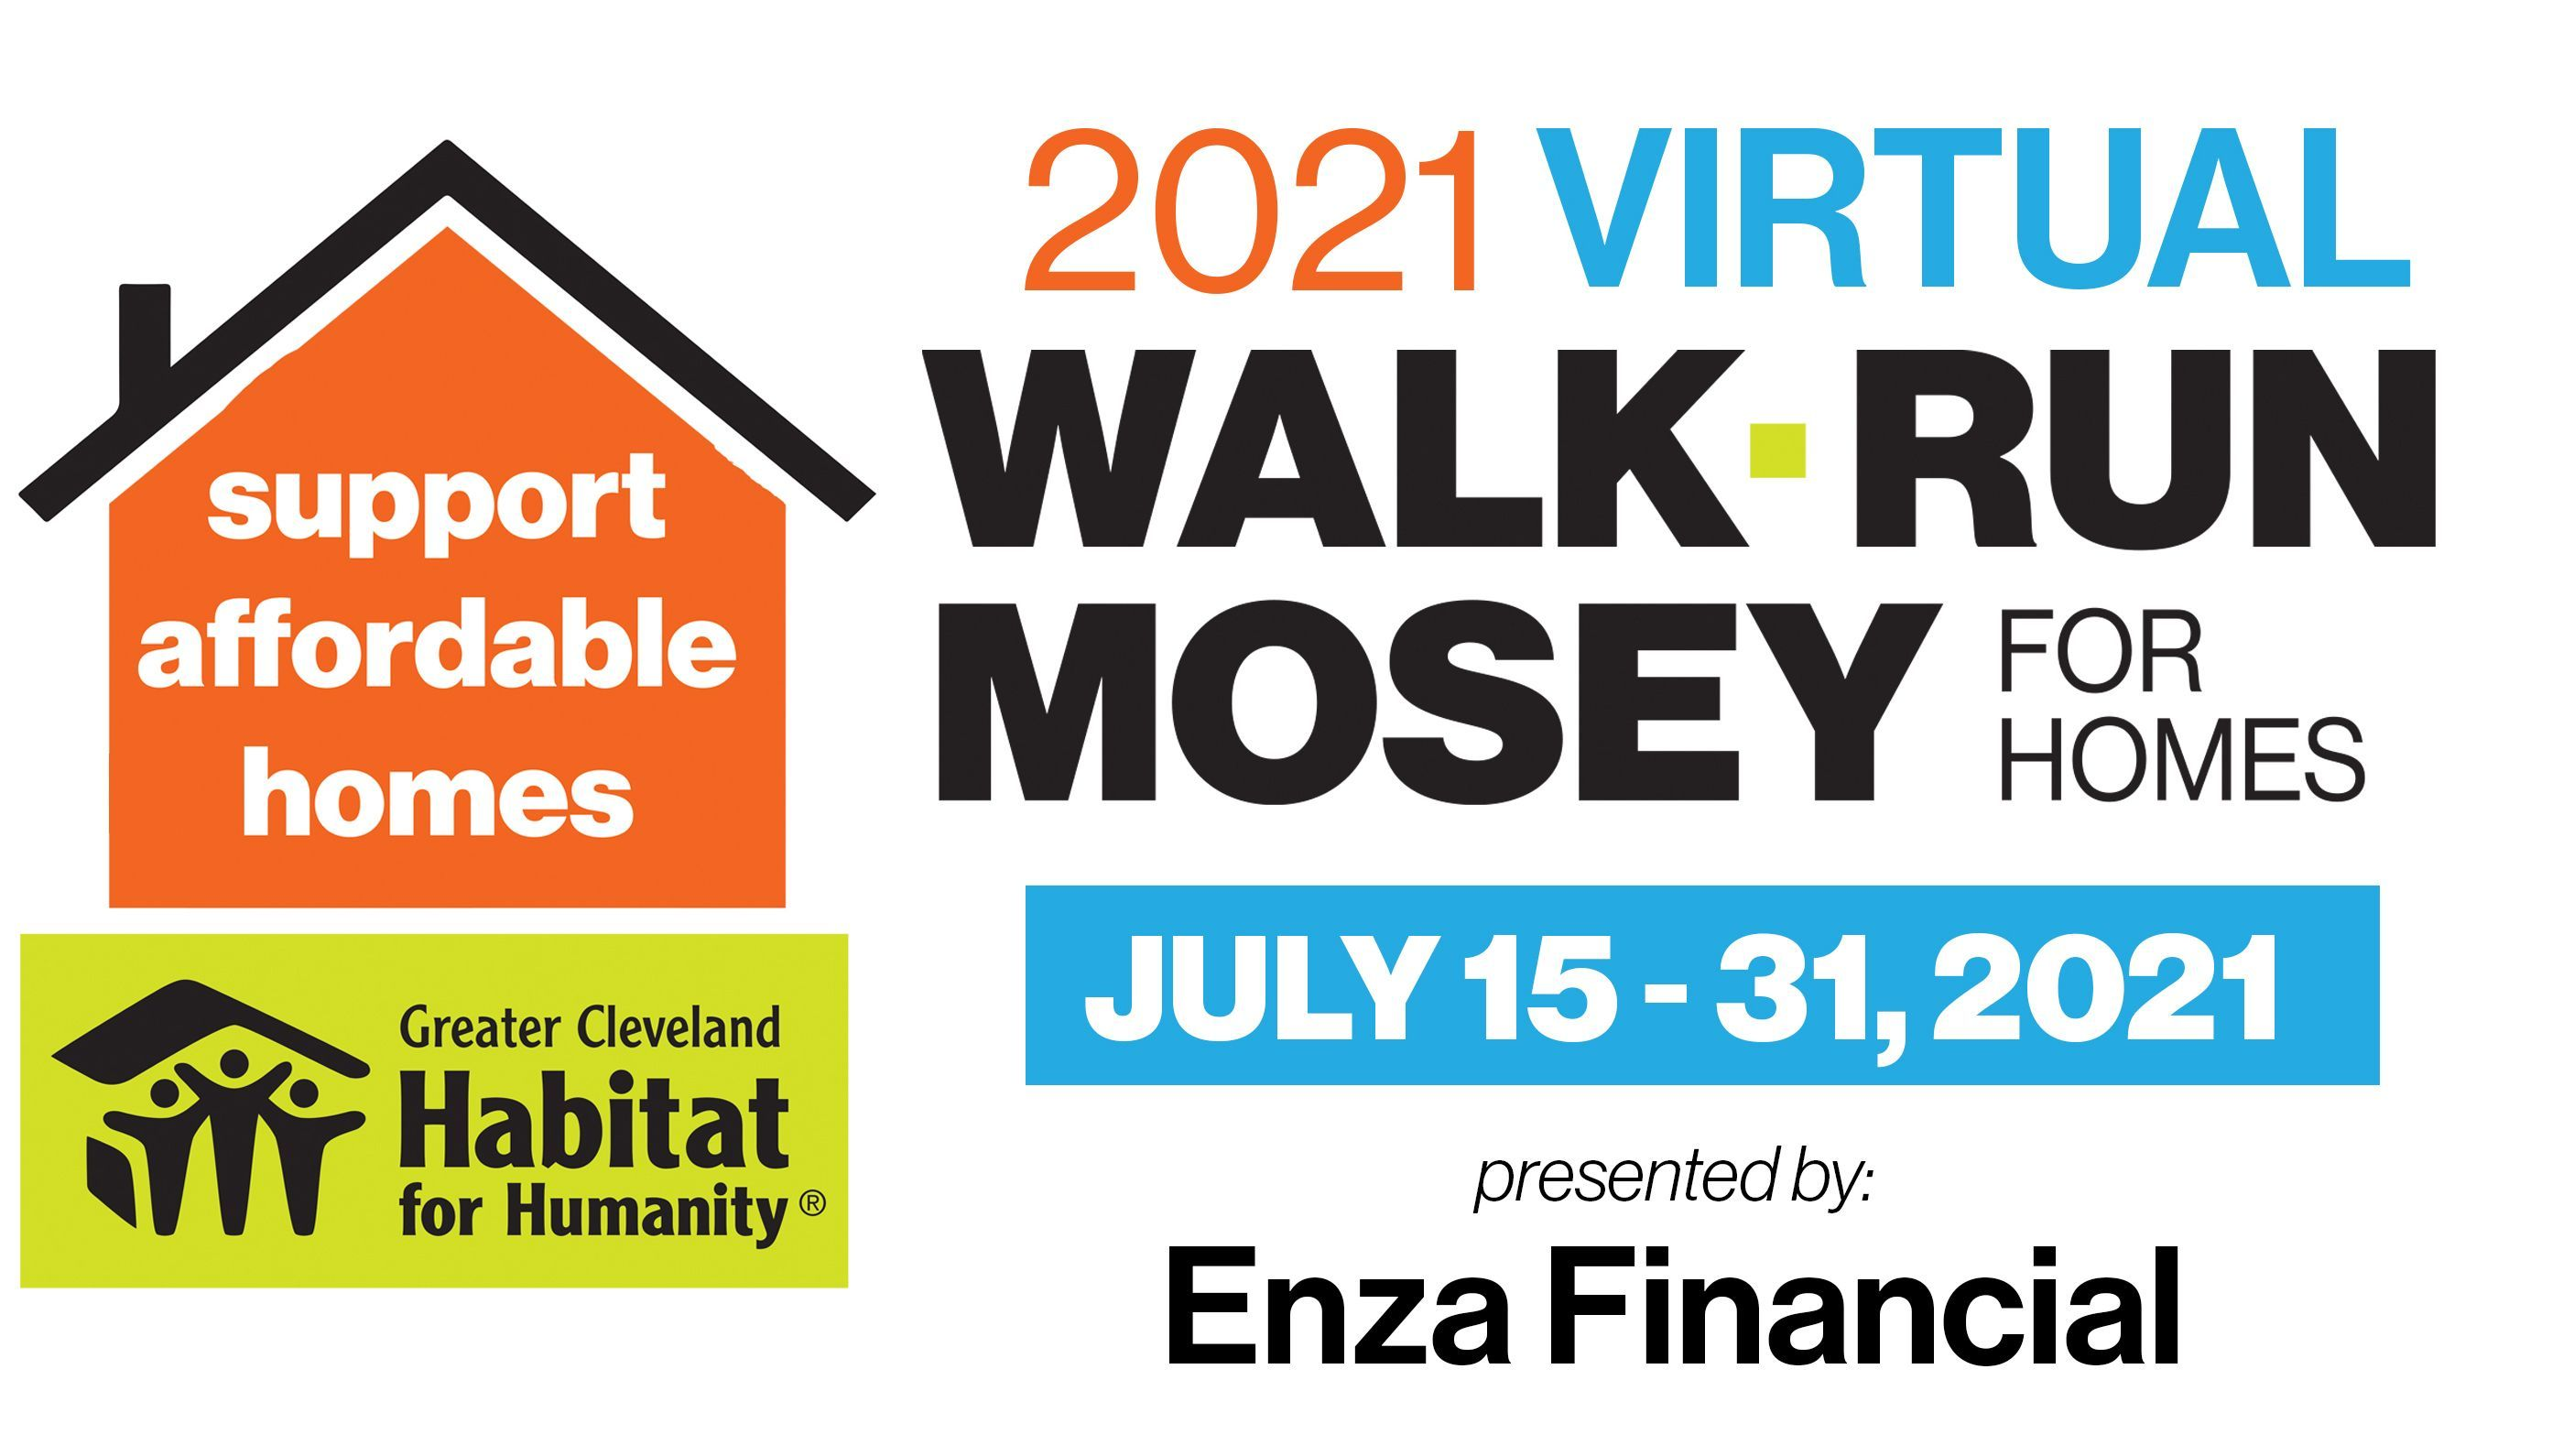 Registration opens for Cleveland Habitat's Virtual Walk, Run, Mosey